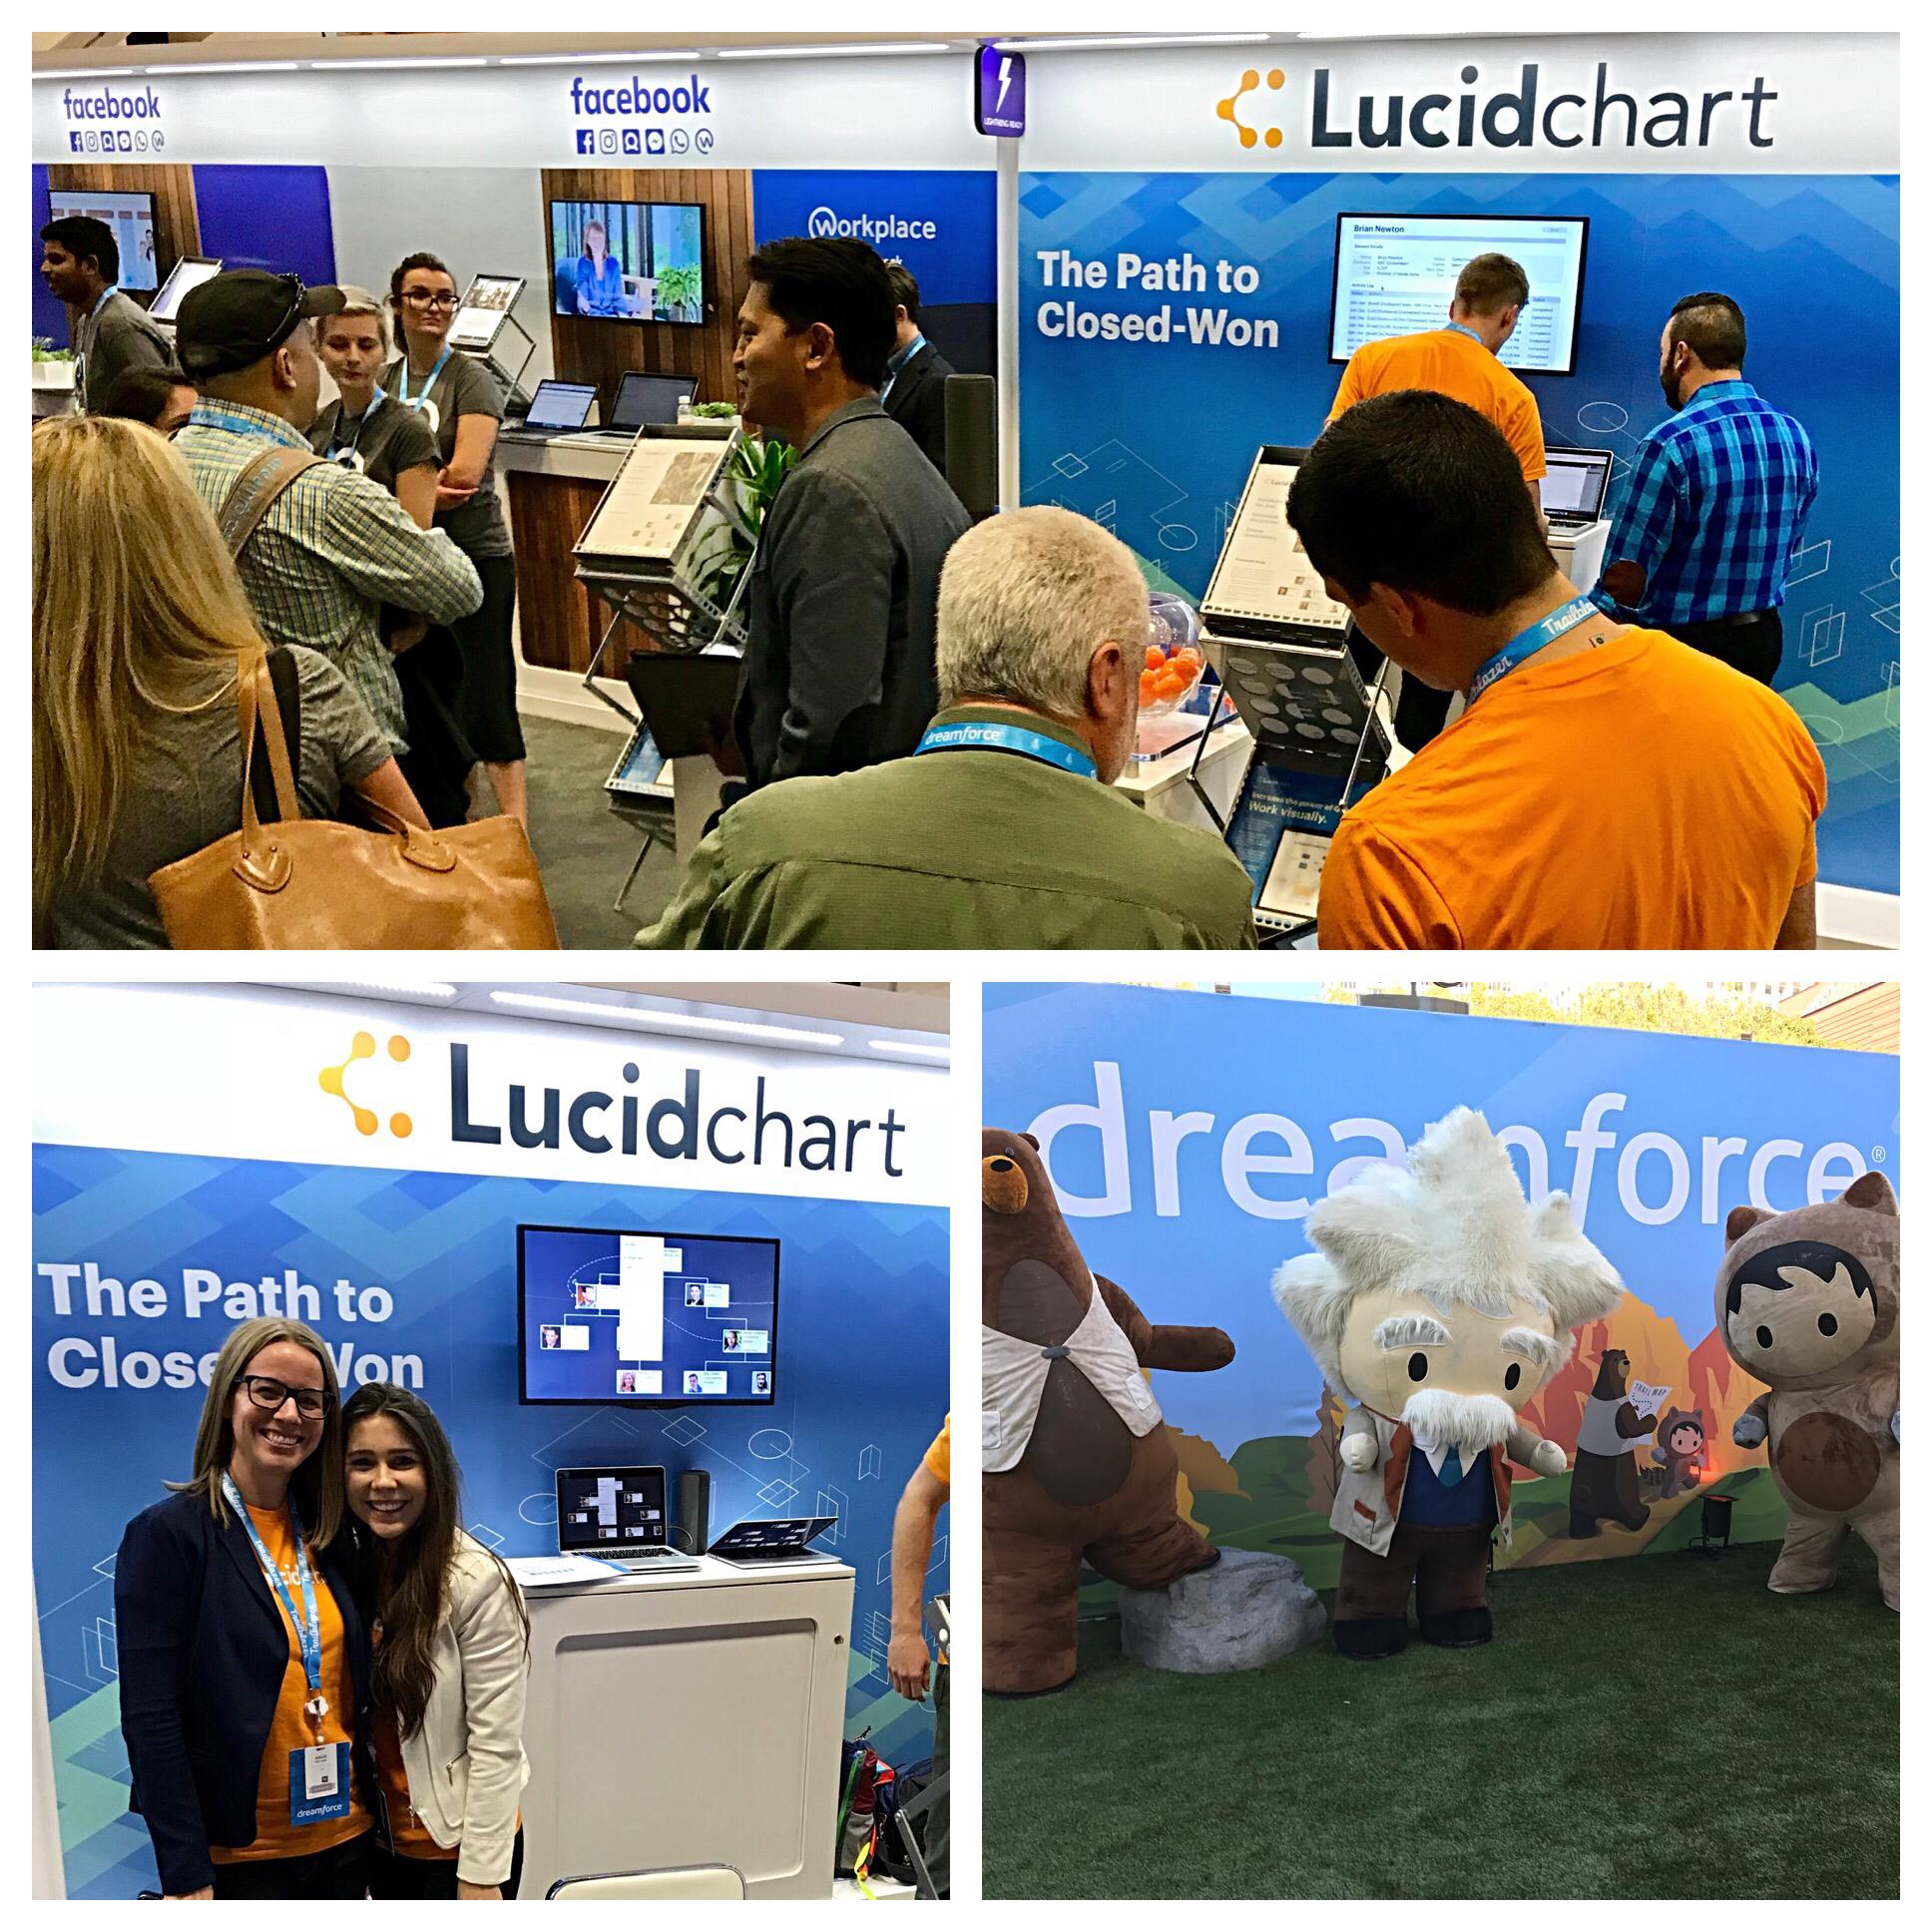 Lucidchart booth at Dreamforce